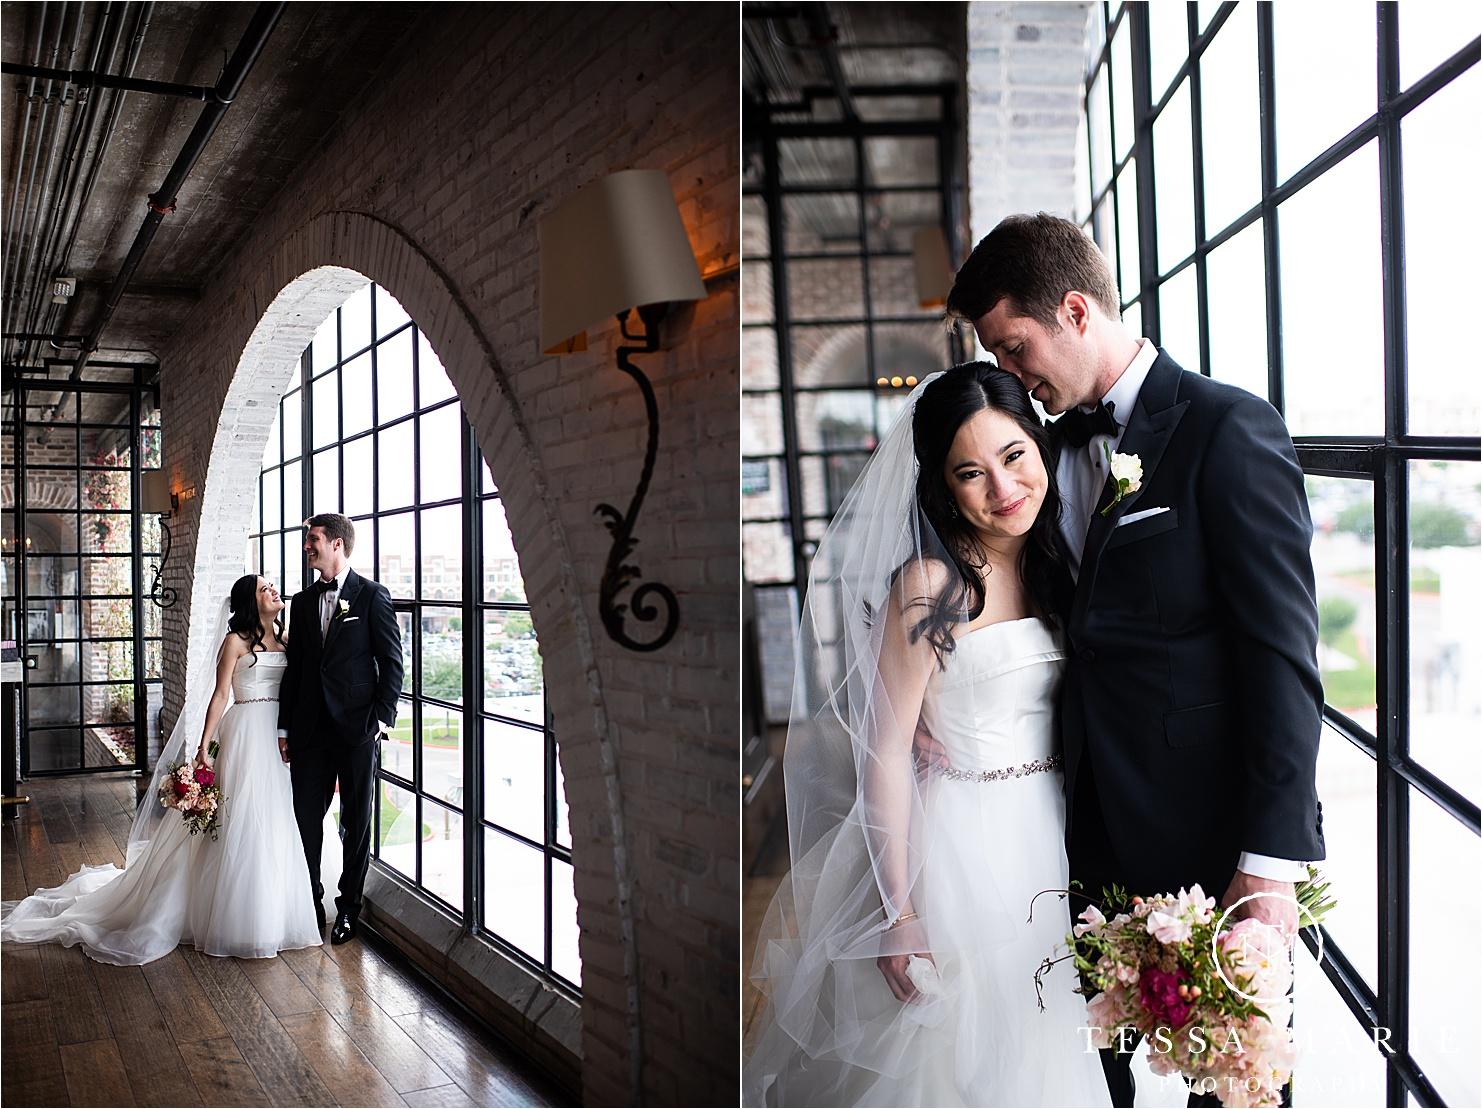 Tessa_marie_weddings_houston_wedding_photographer_The_astorian_0064.jpg